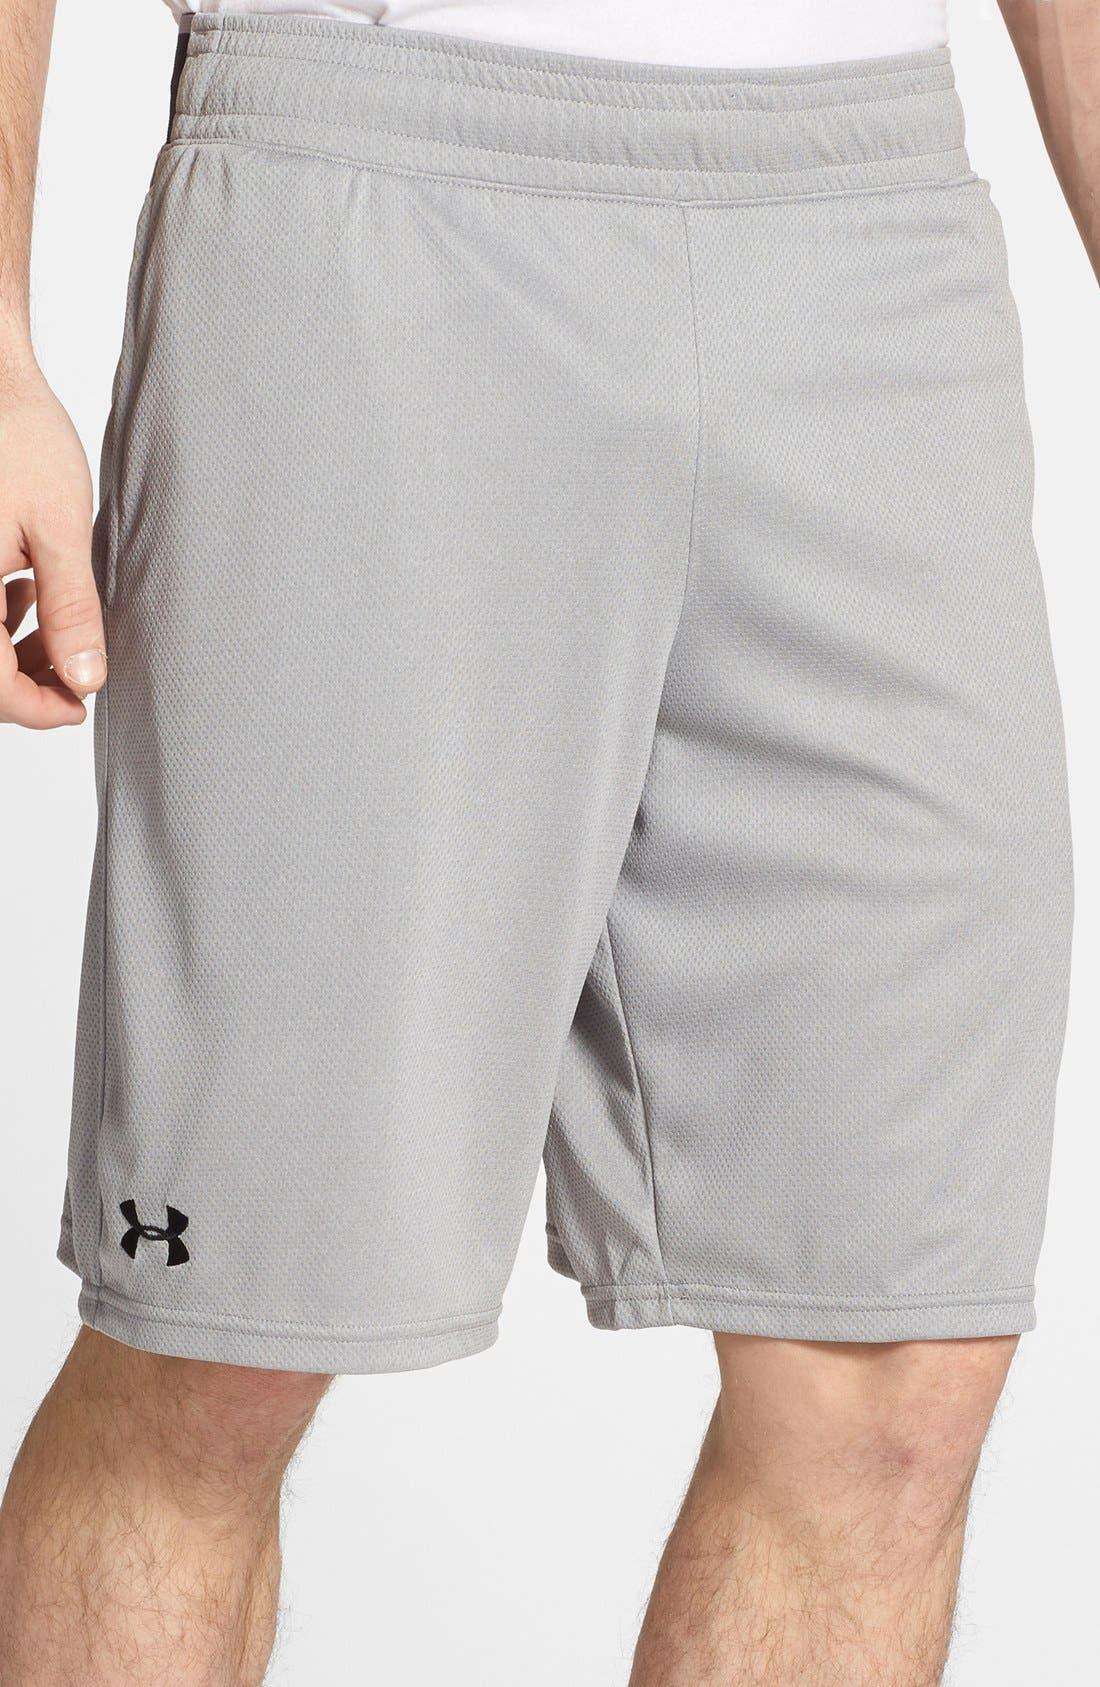 Alternate Image 1 Selected - Under Armour 'Reflex' HeatGear® Mesh Knit Shorts